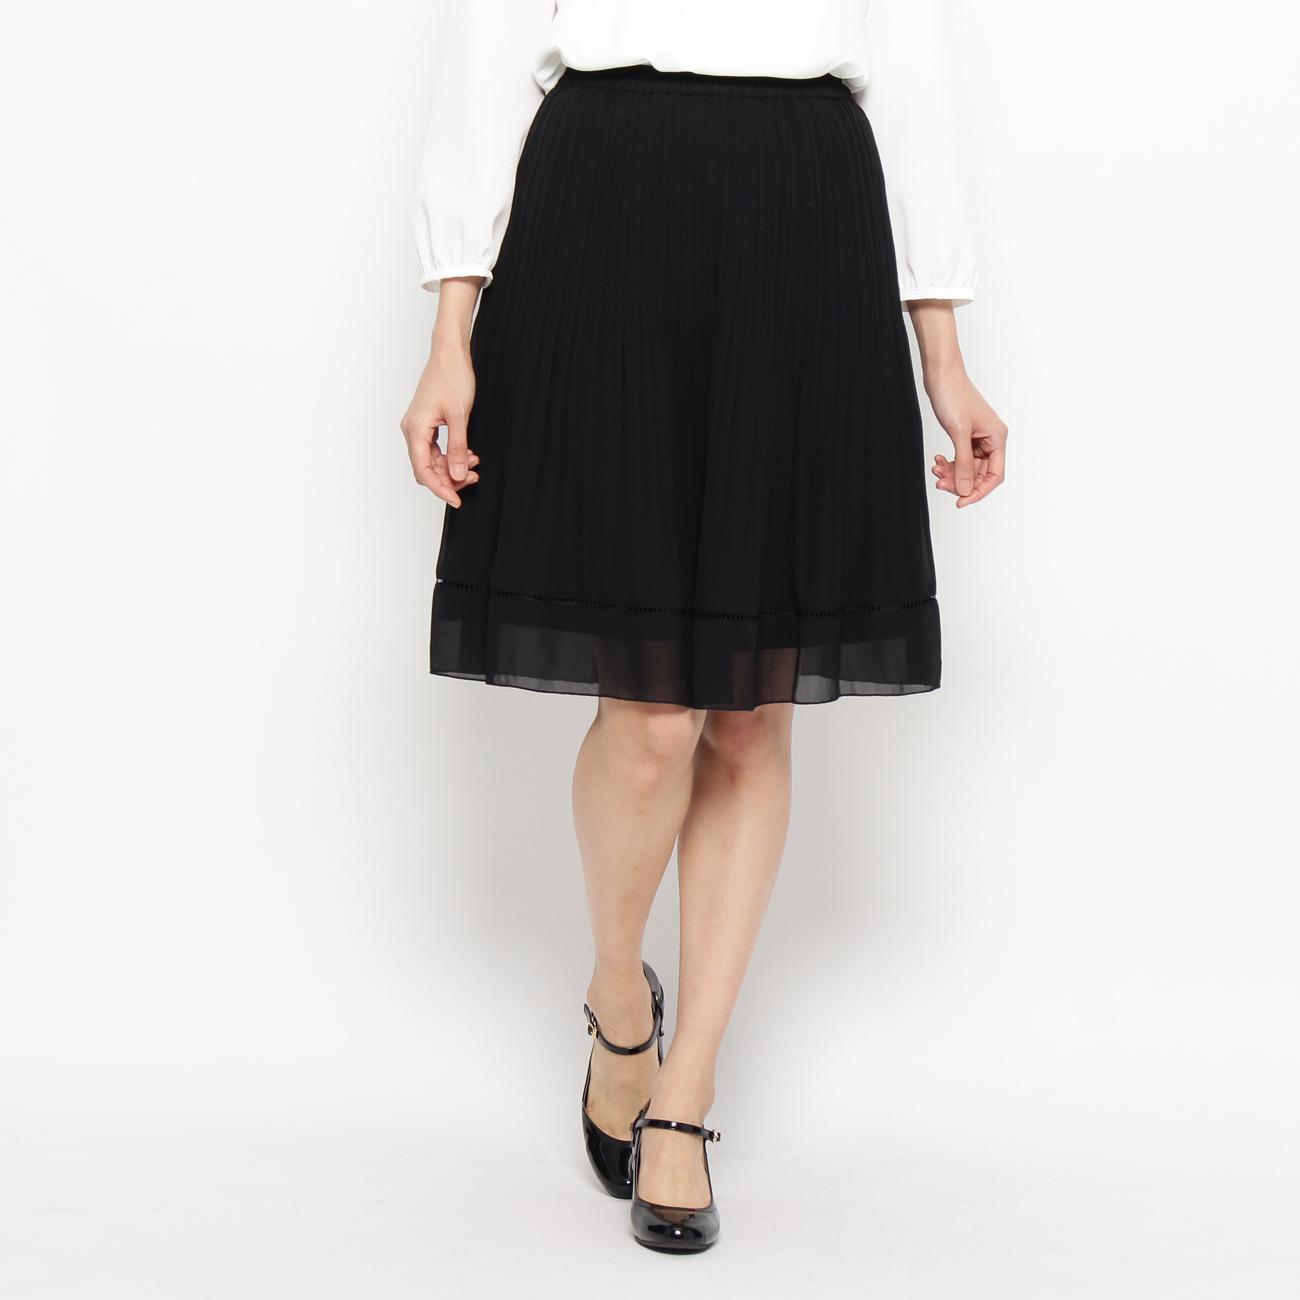 【SHOO・LA・RUE (シューラルー)】ランダムプリーツスカートレディース スカート|ひざ丈 ブラック